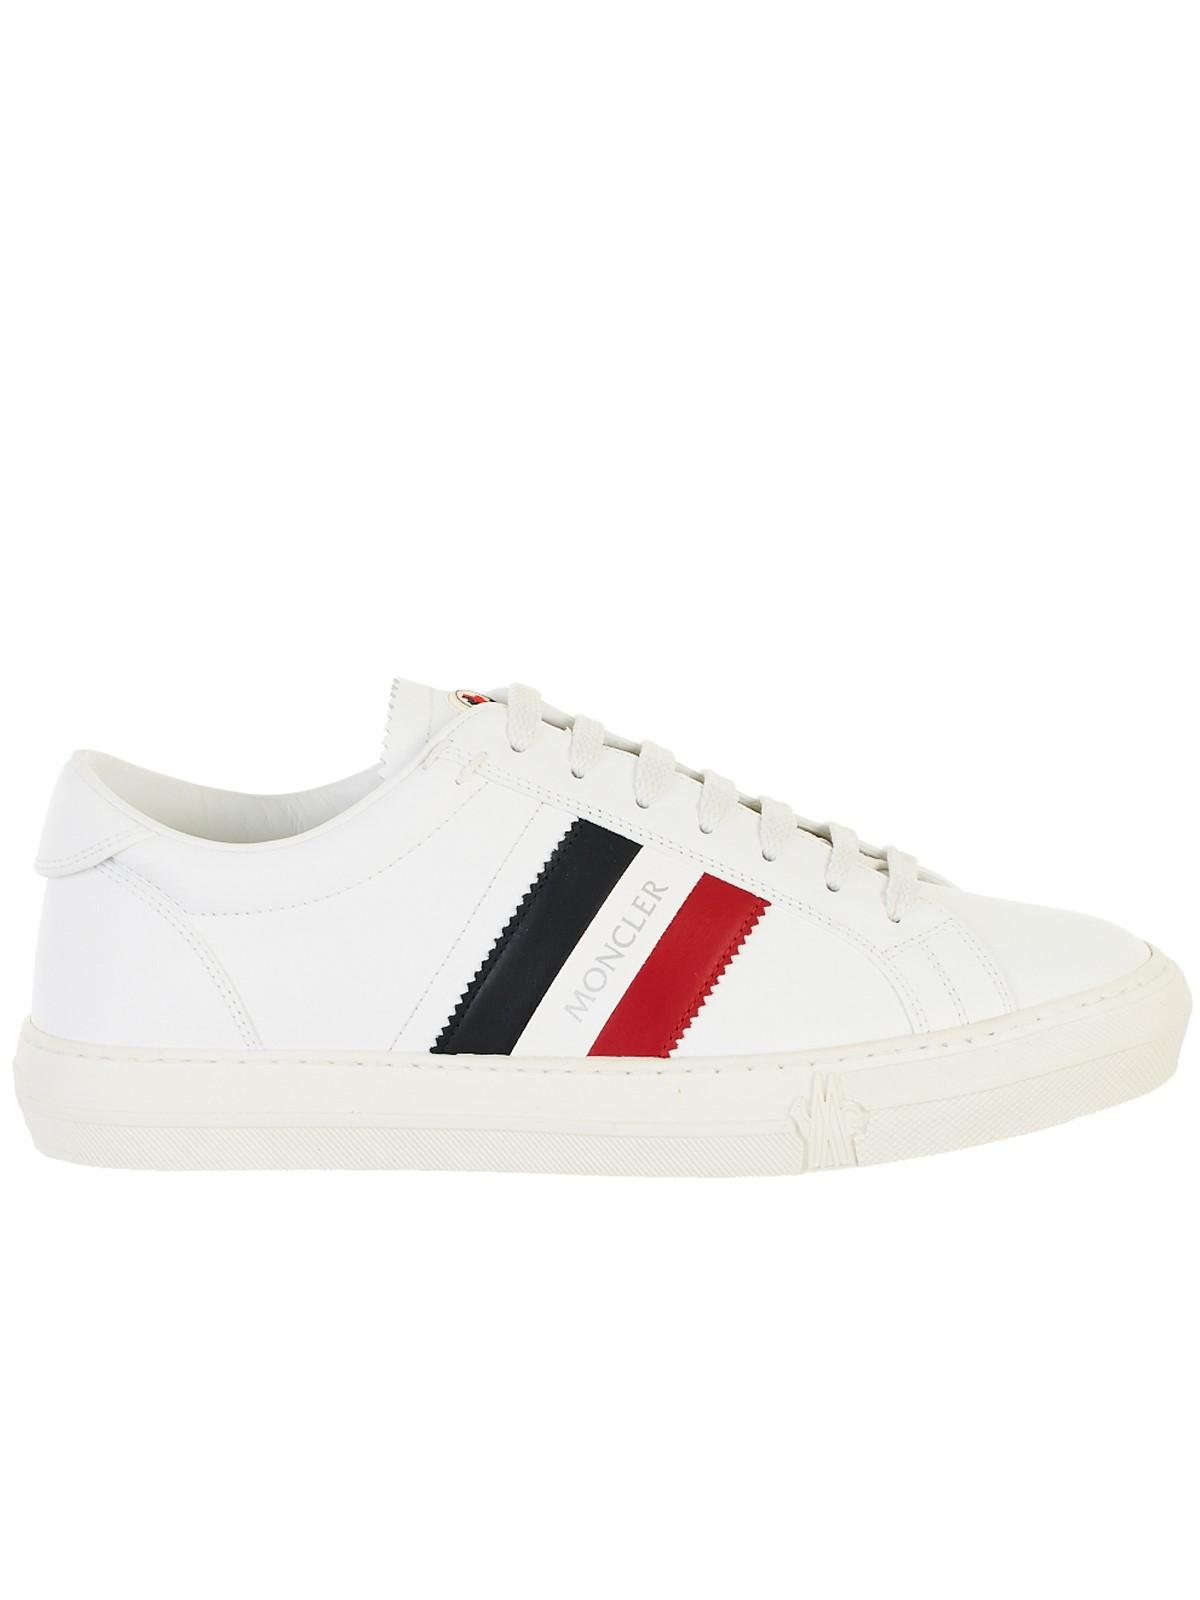 ae71646cb Lyst - Moncler Sneakers White in White for Men